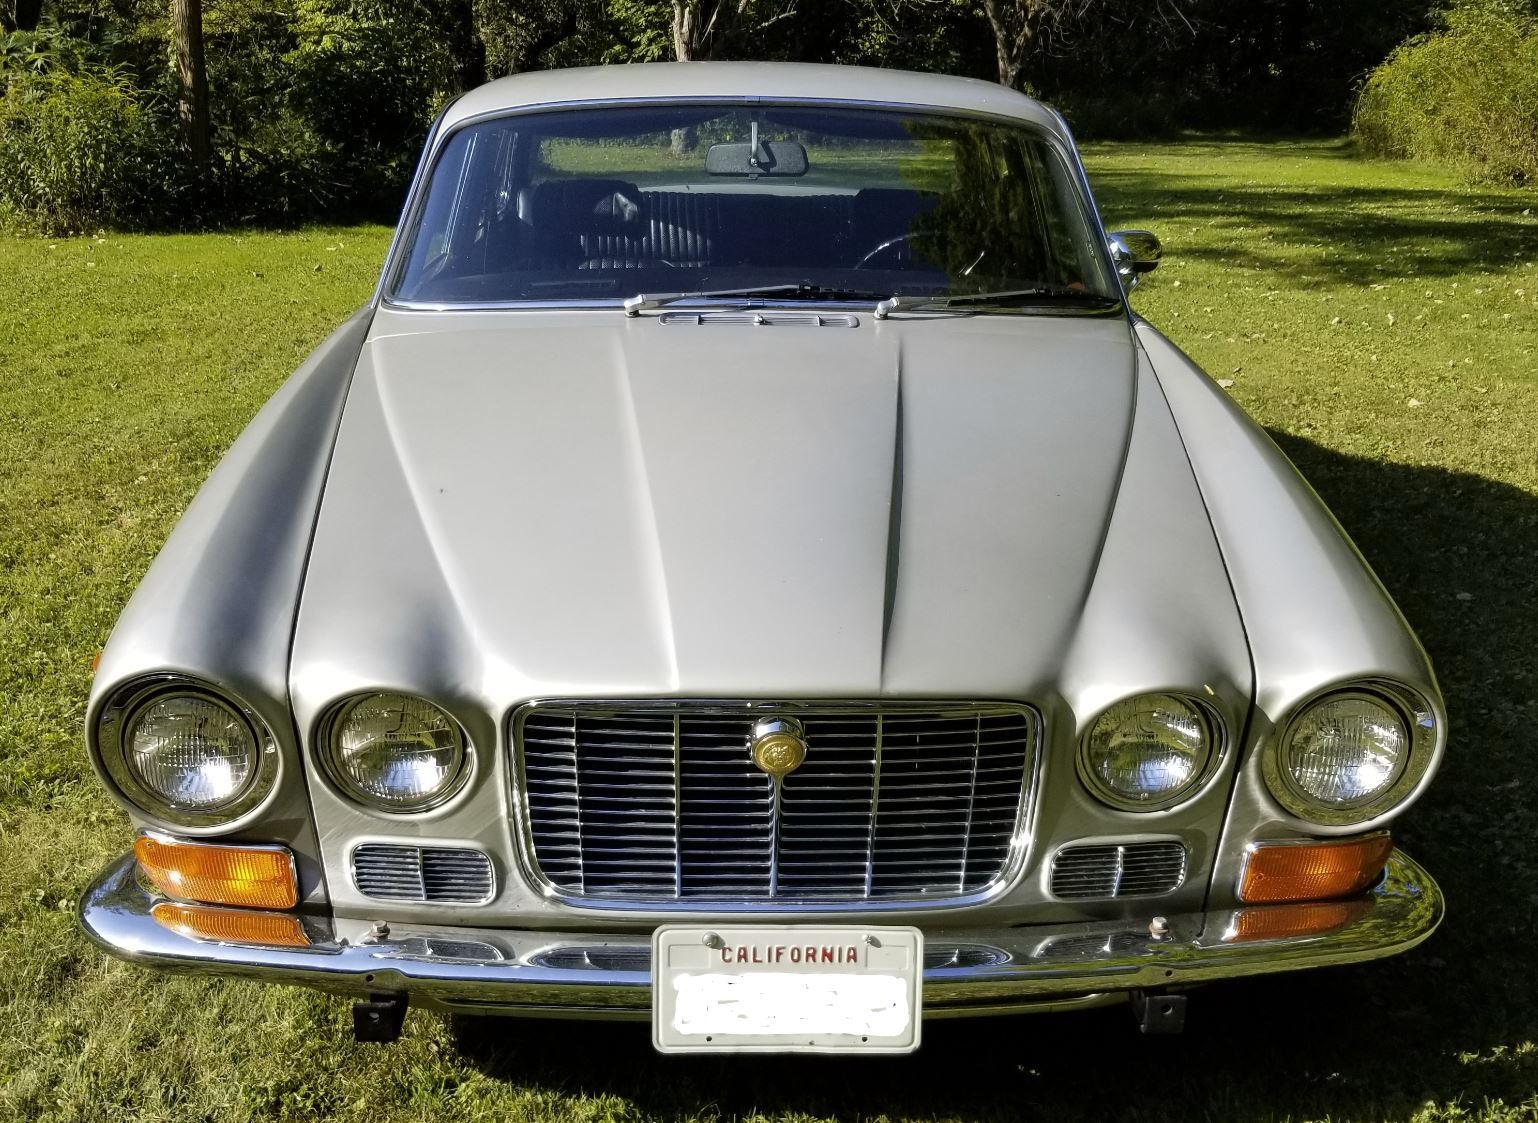 1973 Jaguar XJ-6 XJ6 All Original, Excellent overall - Jaguar Forums - Jaguar Enthusiasts Forum